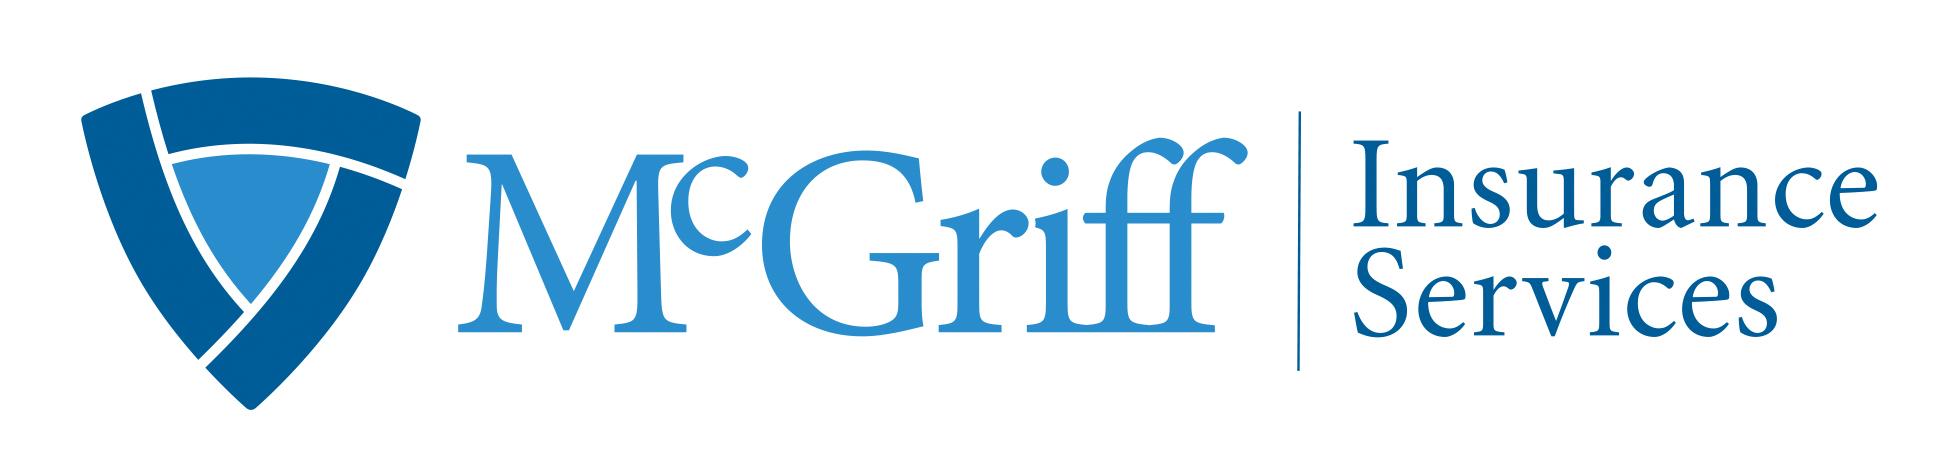 McGriff Insurance